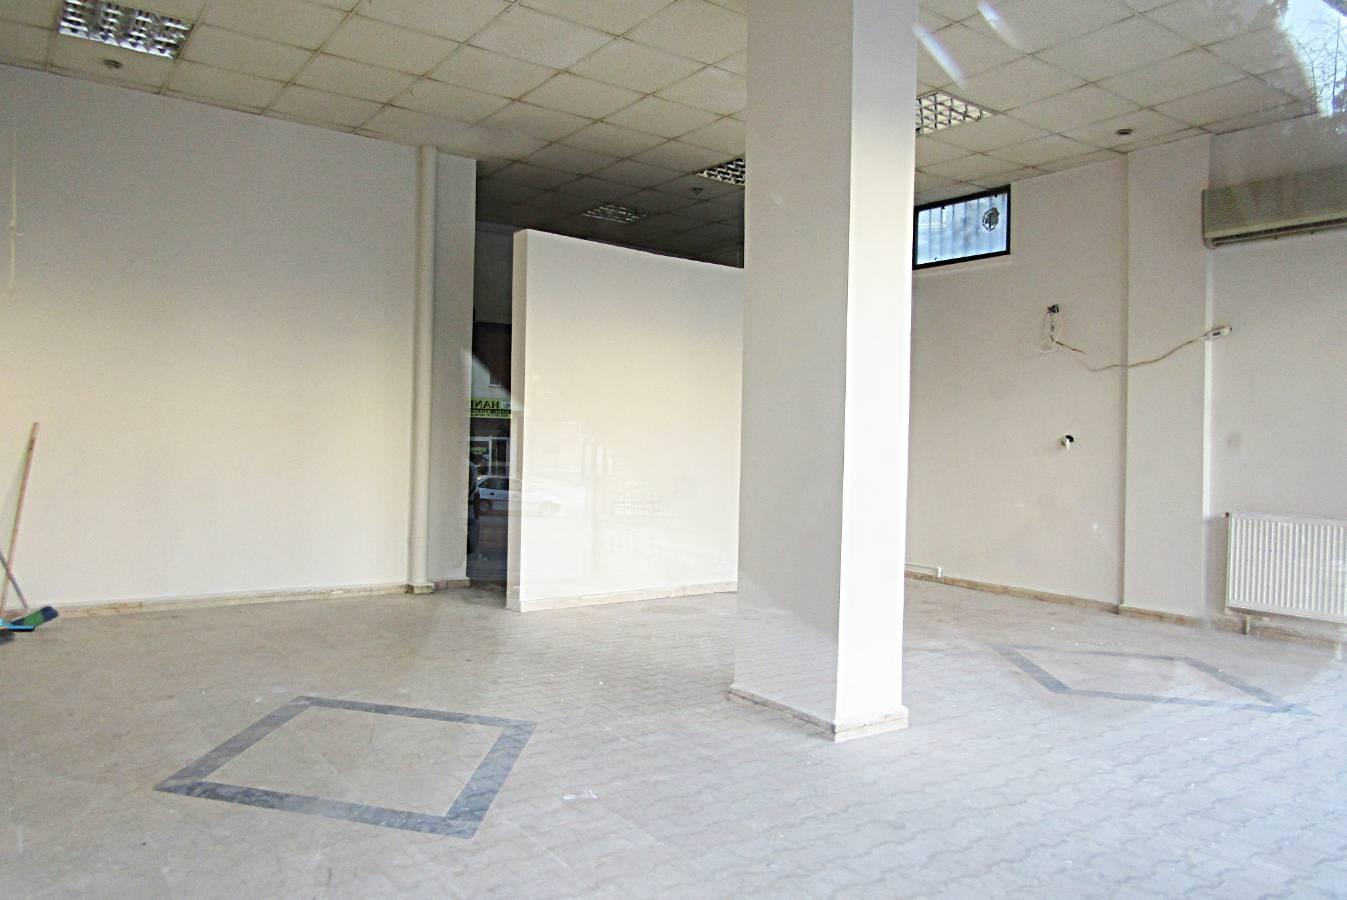 SR EMLAK'TAN PİYADE MAH'DE 65m² CADDEYE YAKIN DÜKKAN